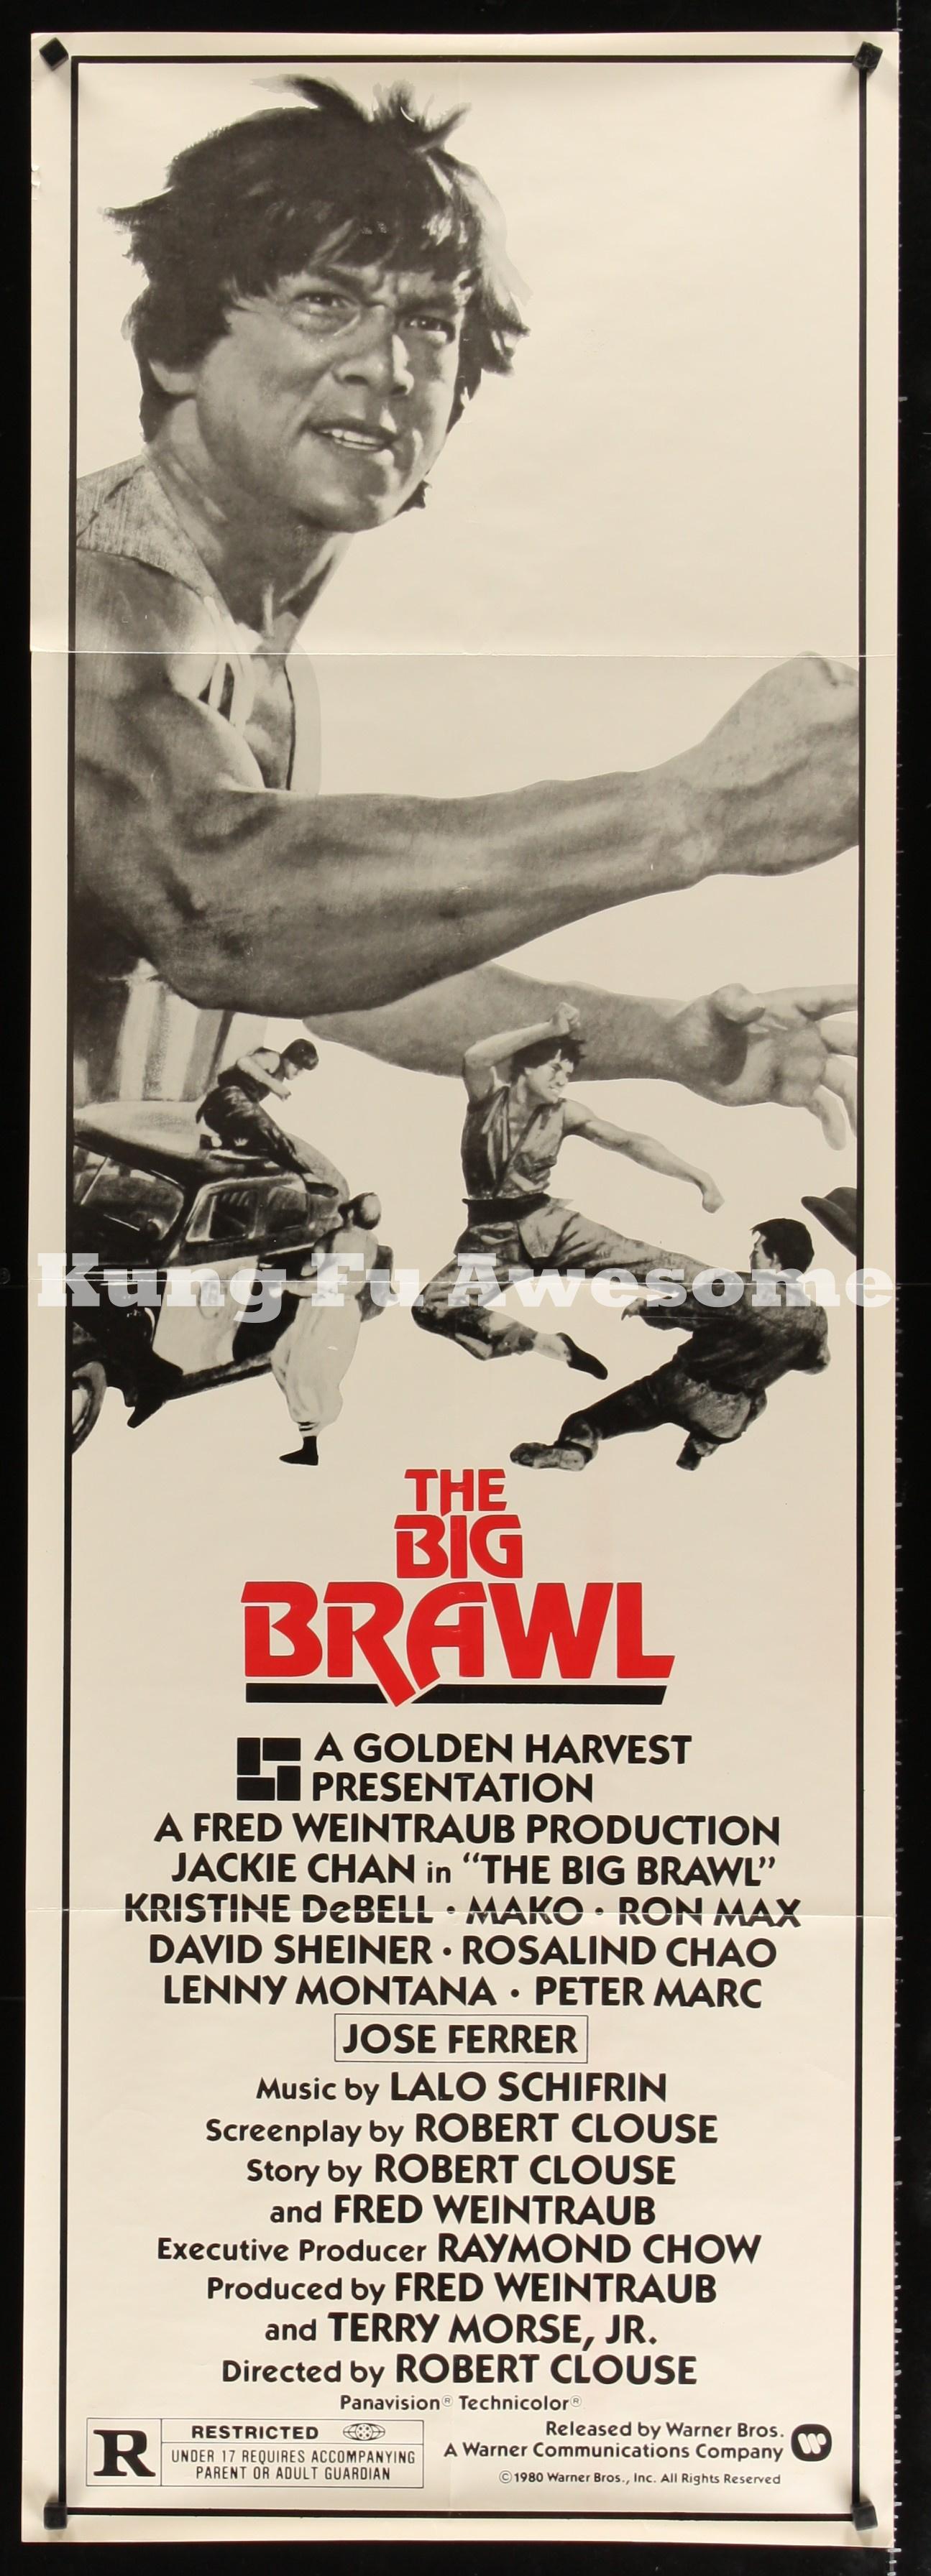 door_panel_big_brawl_JC05968_L.jpg